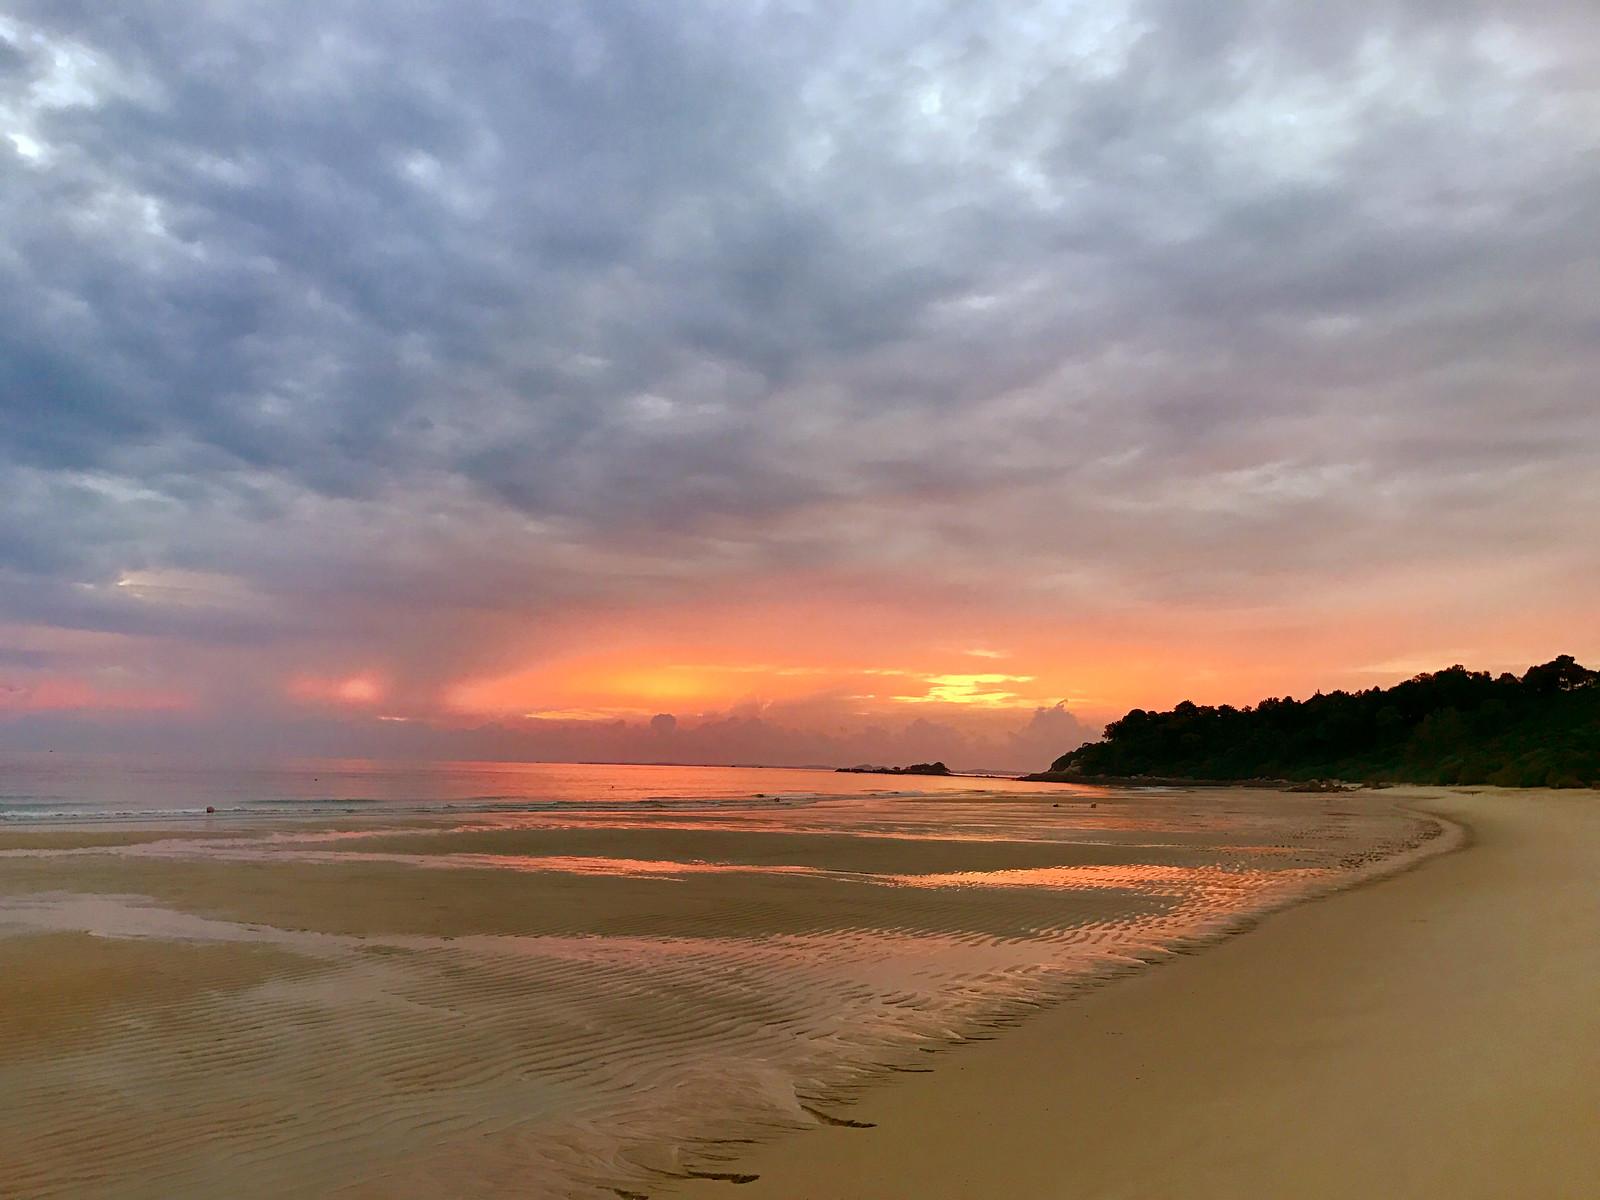 sunrise 545 am